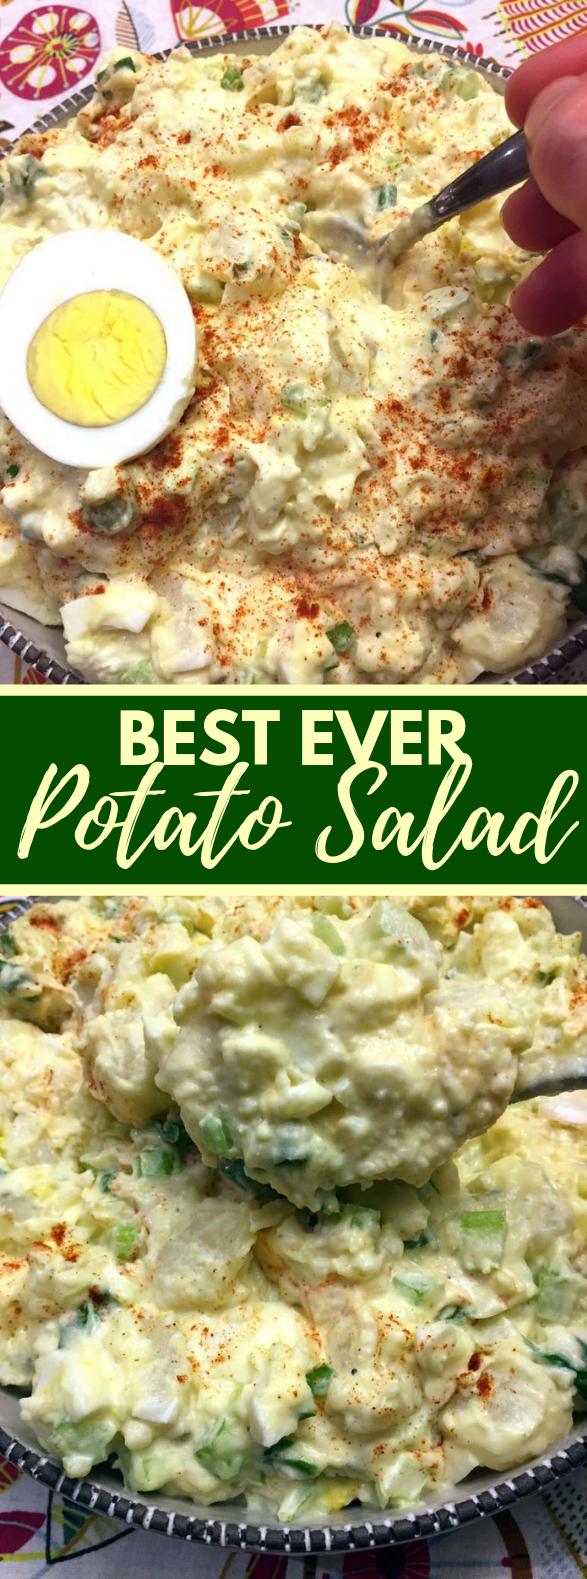 Best Potato Salad Recipe Ever #vegetarian #glutenfree